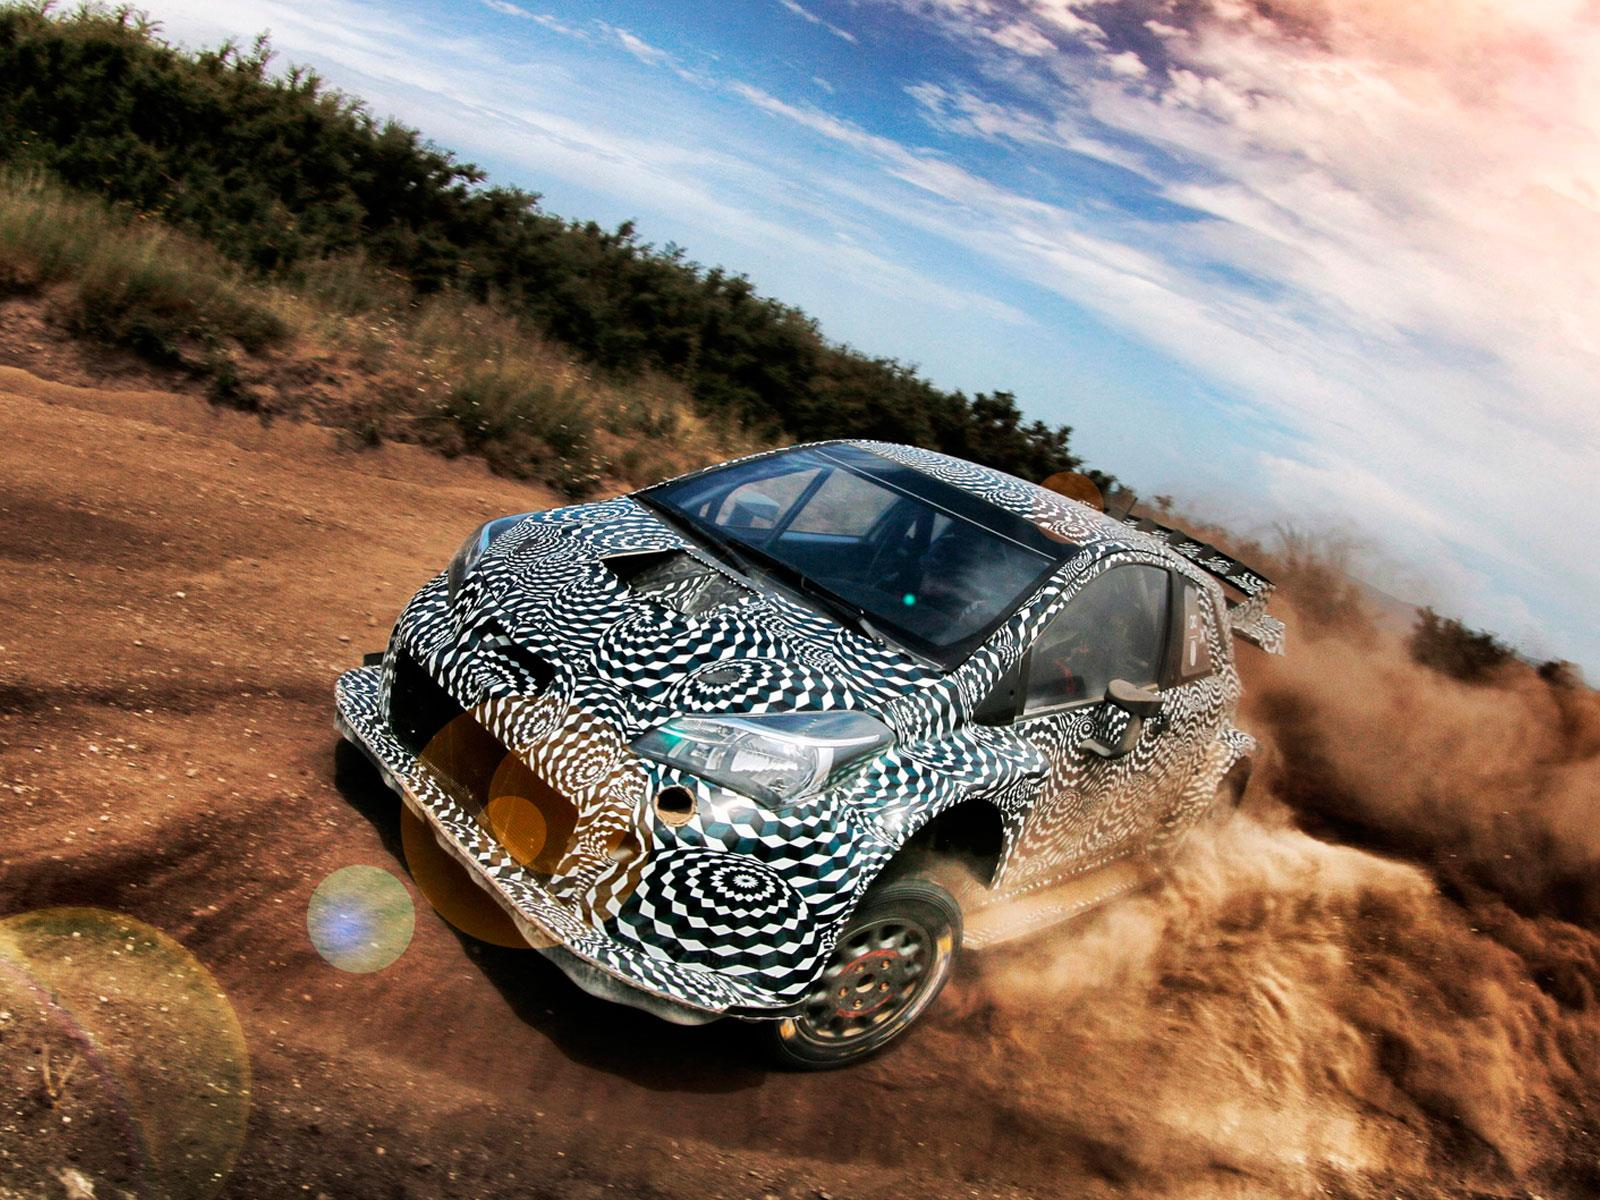 Toyota ultima los detalles del Yaris WRC 2017